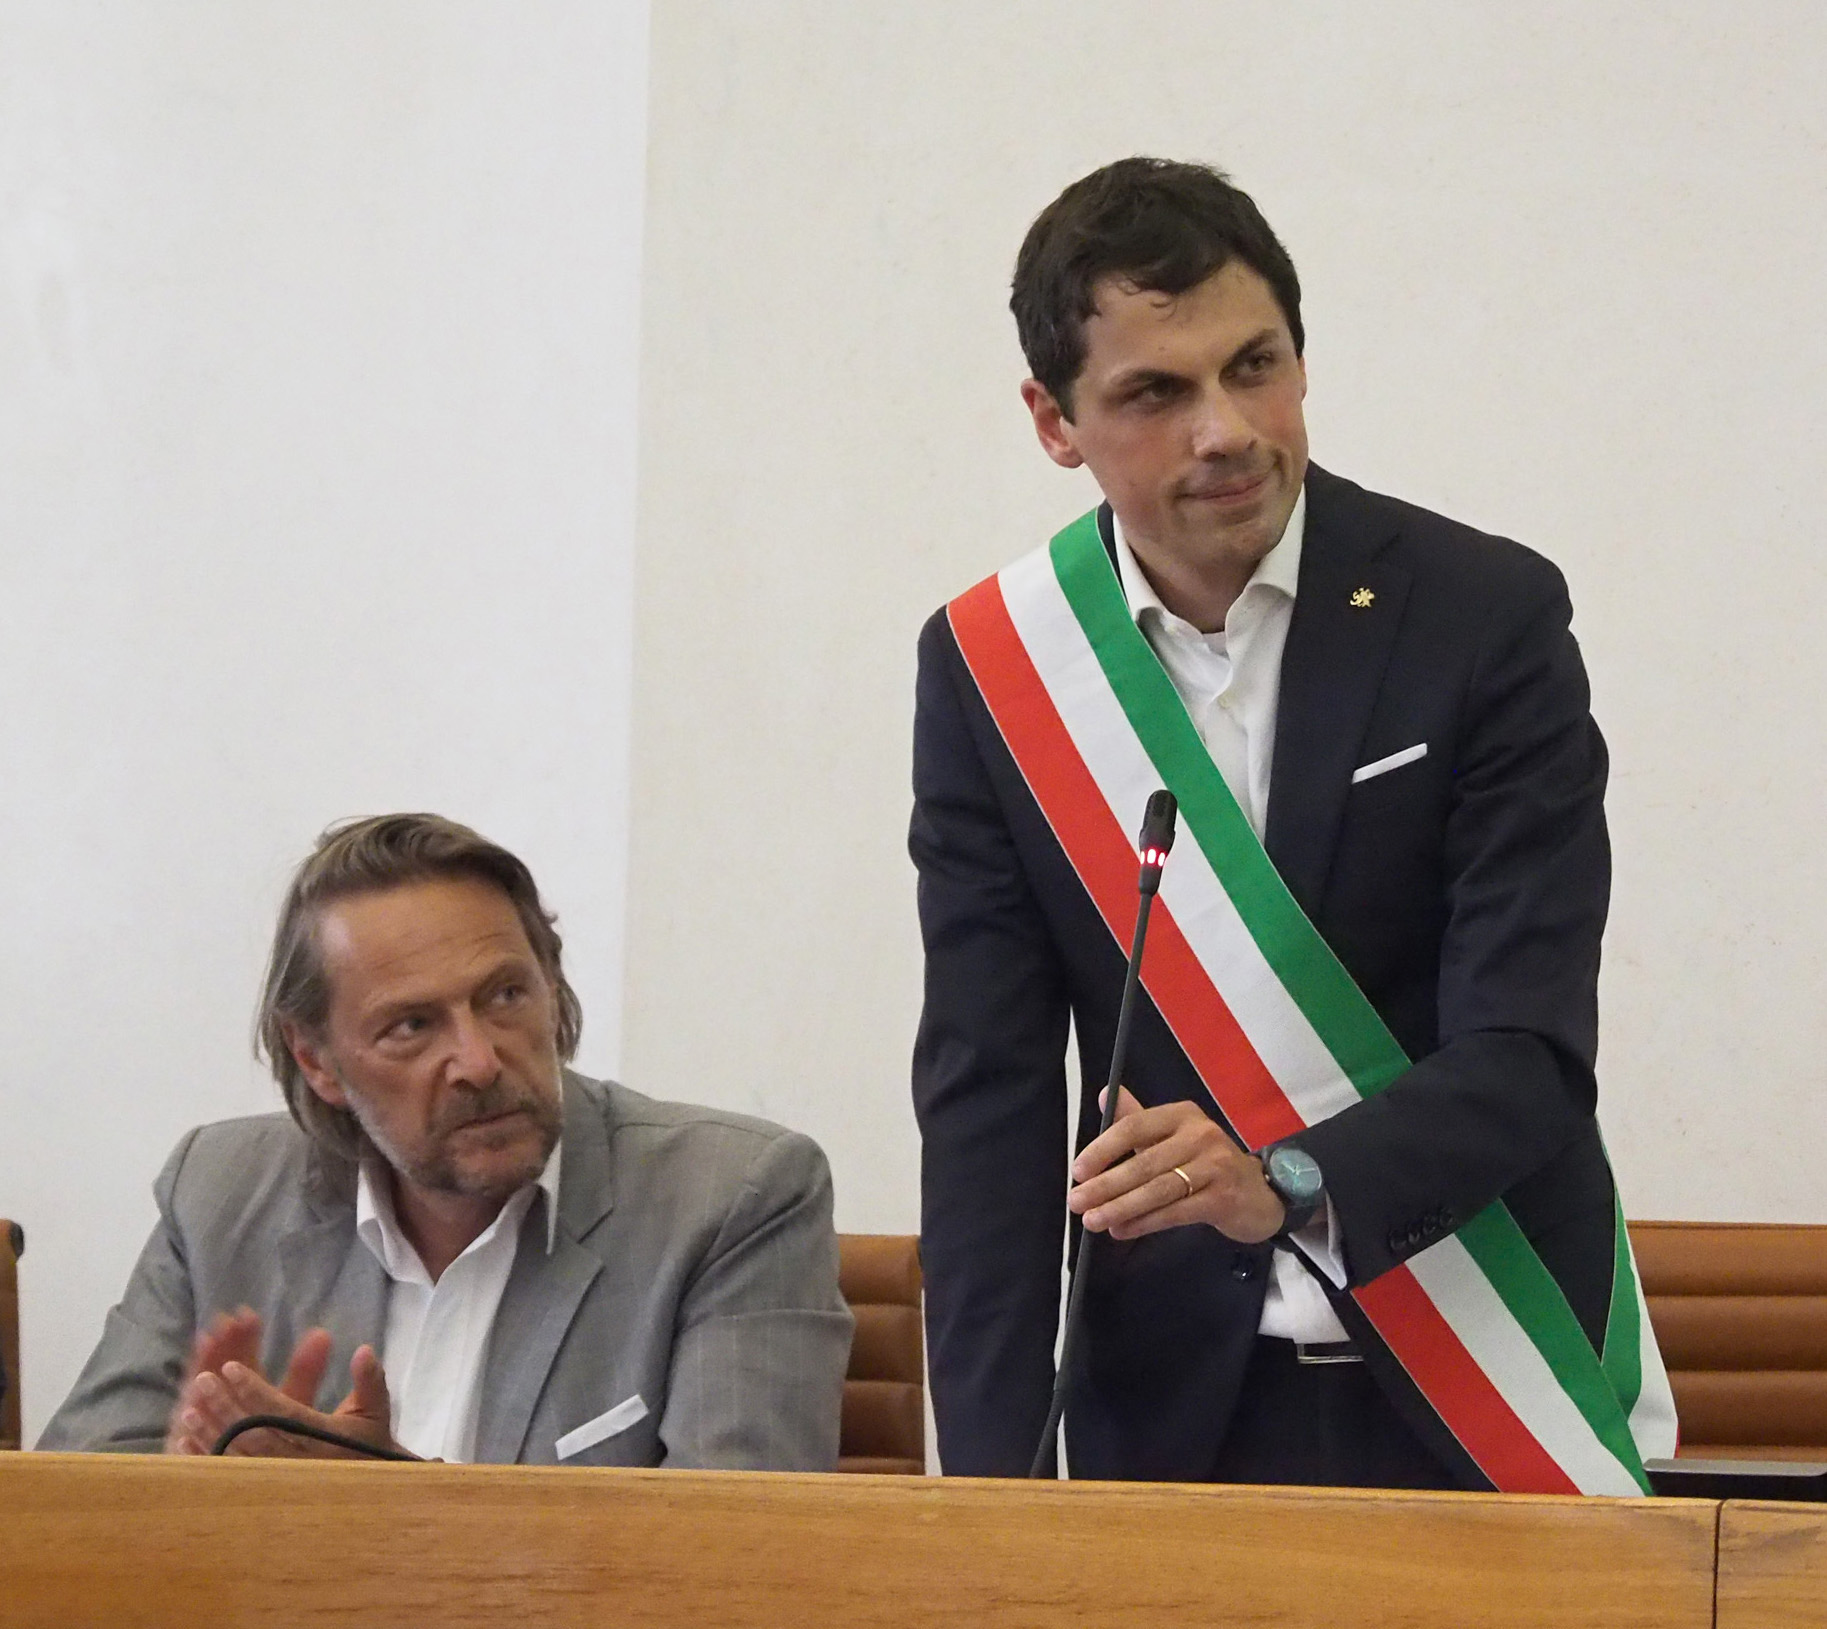 Consiglio comunale Perugia/ legislatura aperta con: esame ...